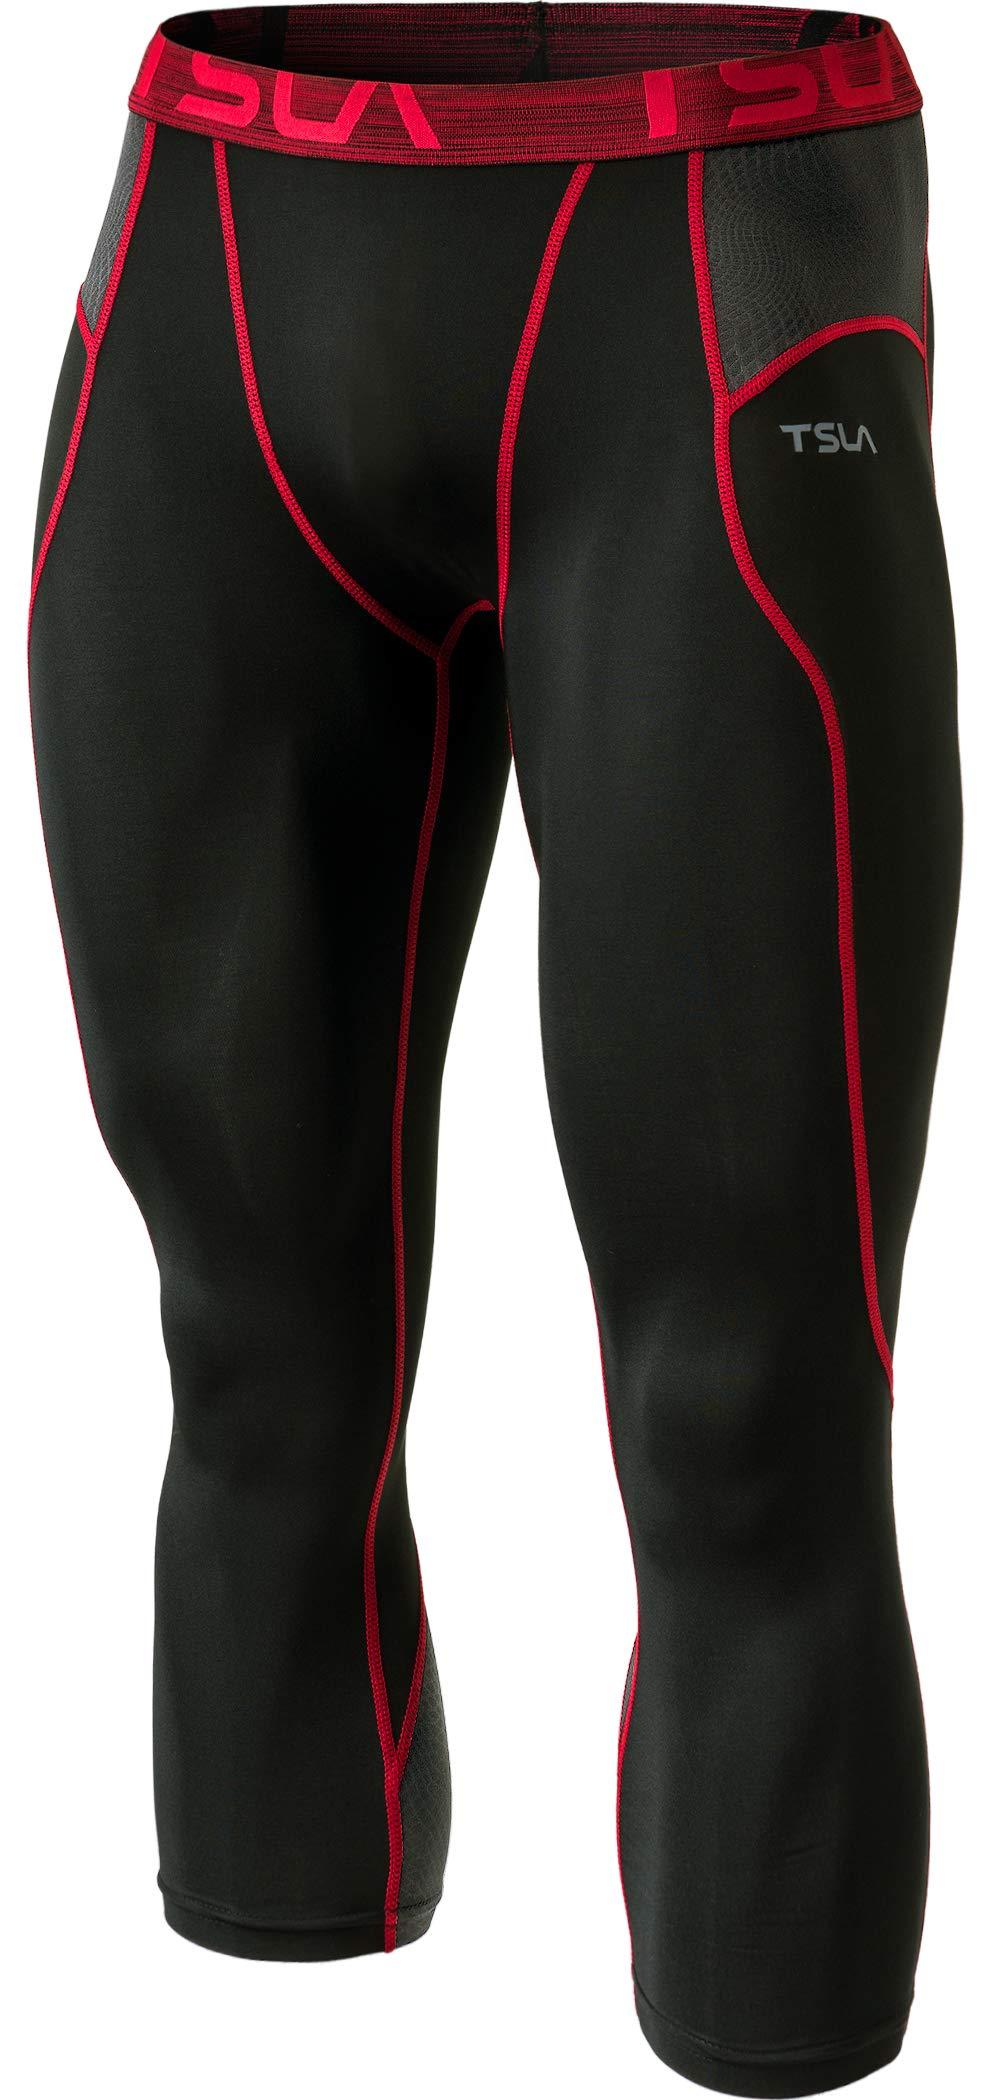 TSLA Men's Compression 3/4 Capri Pants Baselayer Cool Dry Sports Running Yoga Tights, Print(muc28) - Black & Red, Small by TSLA